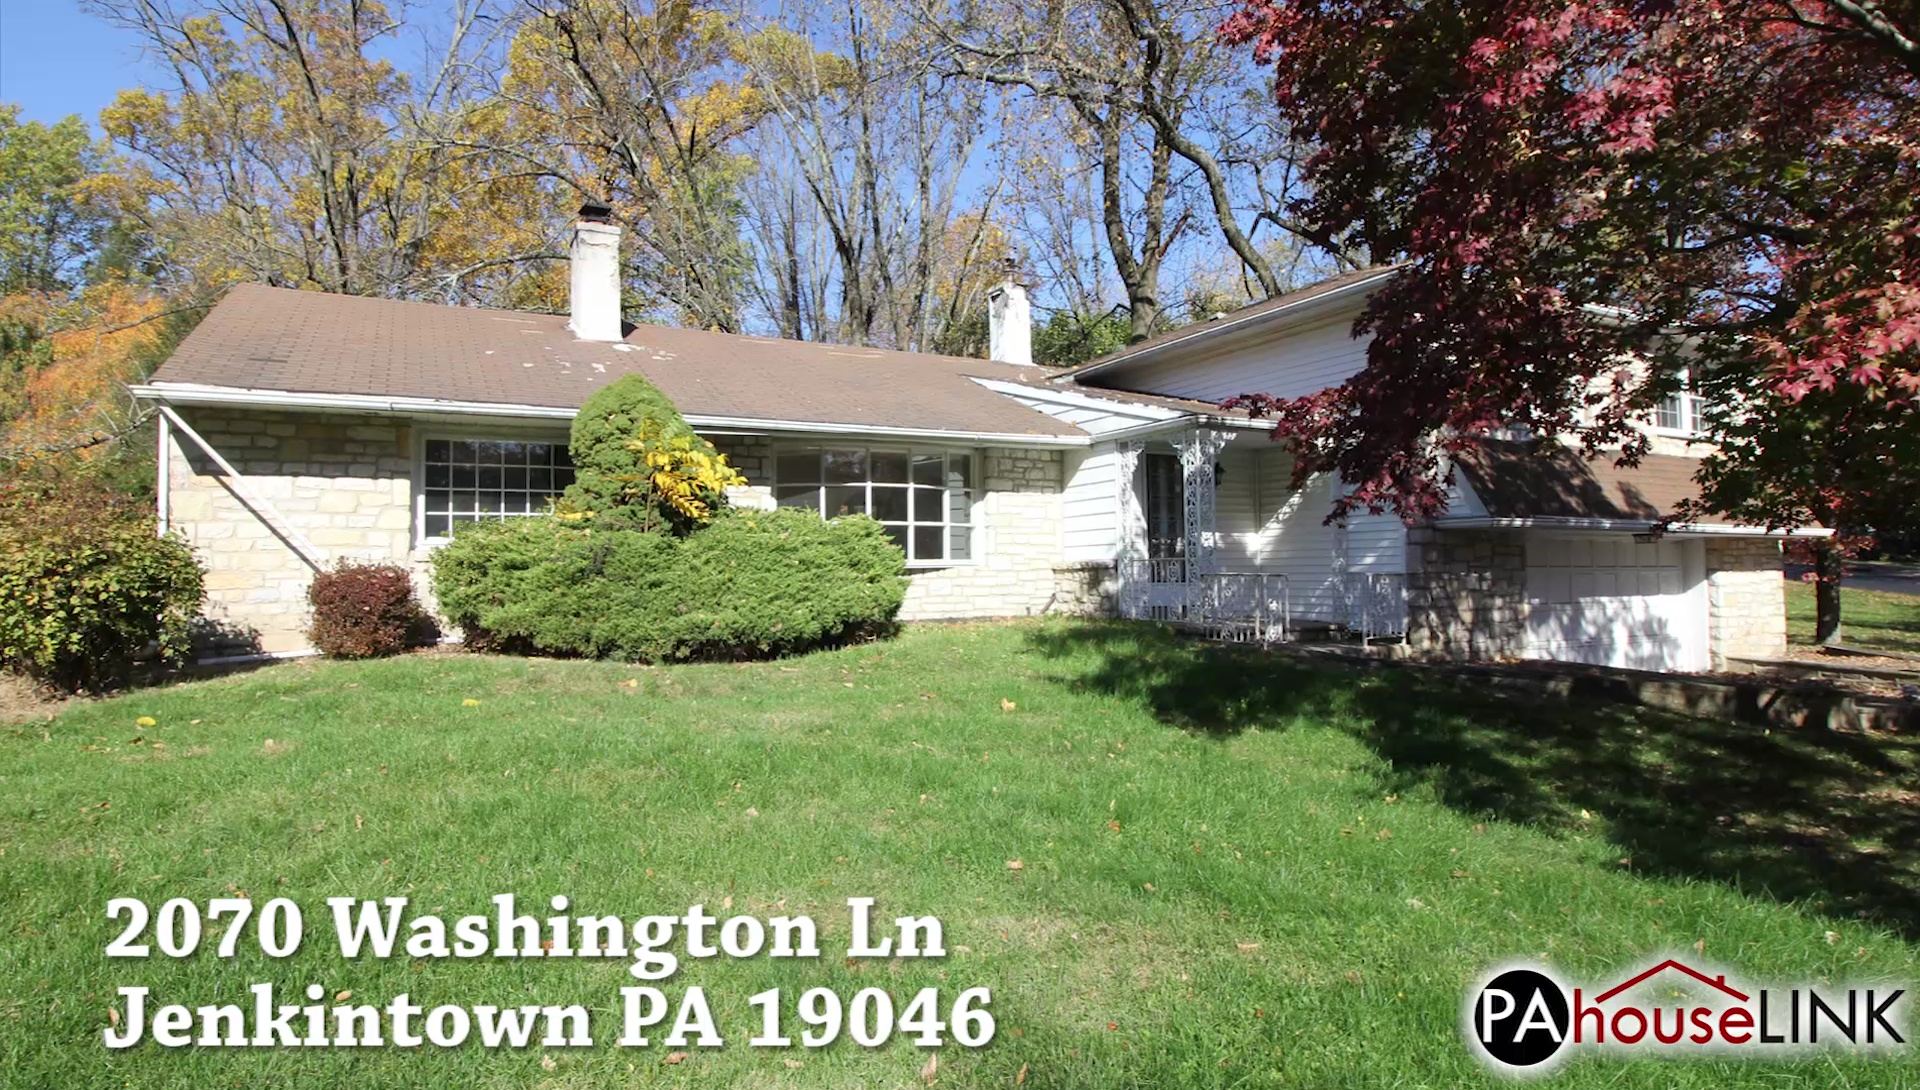 2070 Washington Ln Jenkintown PA 19046 | Coming Soon Foreclosure Properties Jenkintown PA 19046